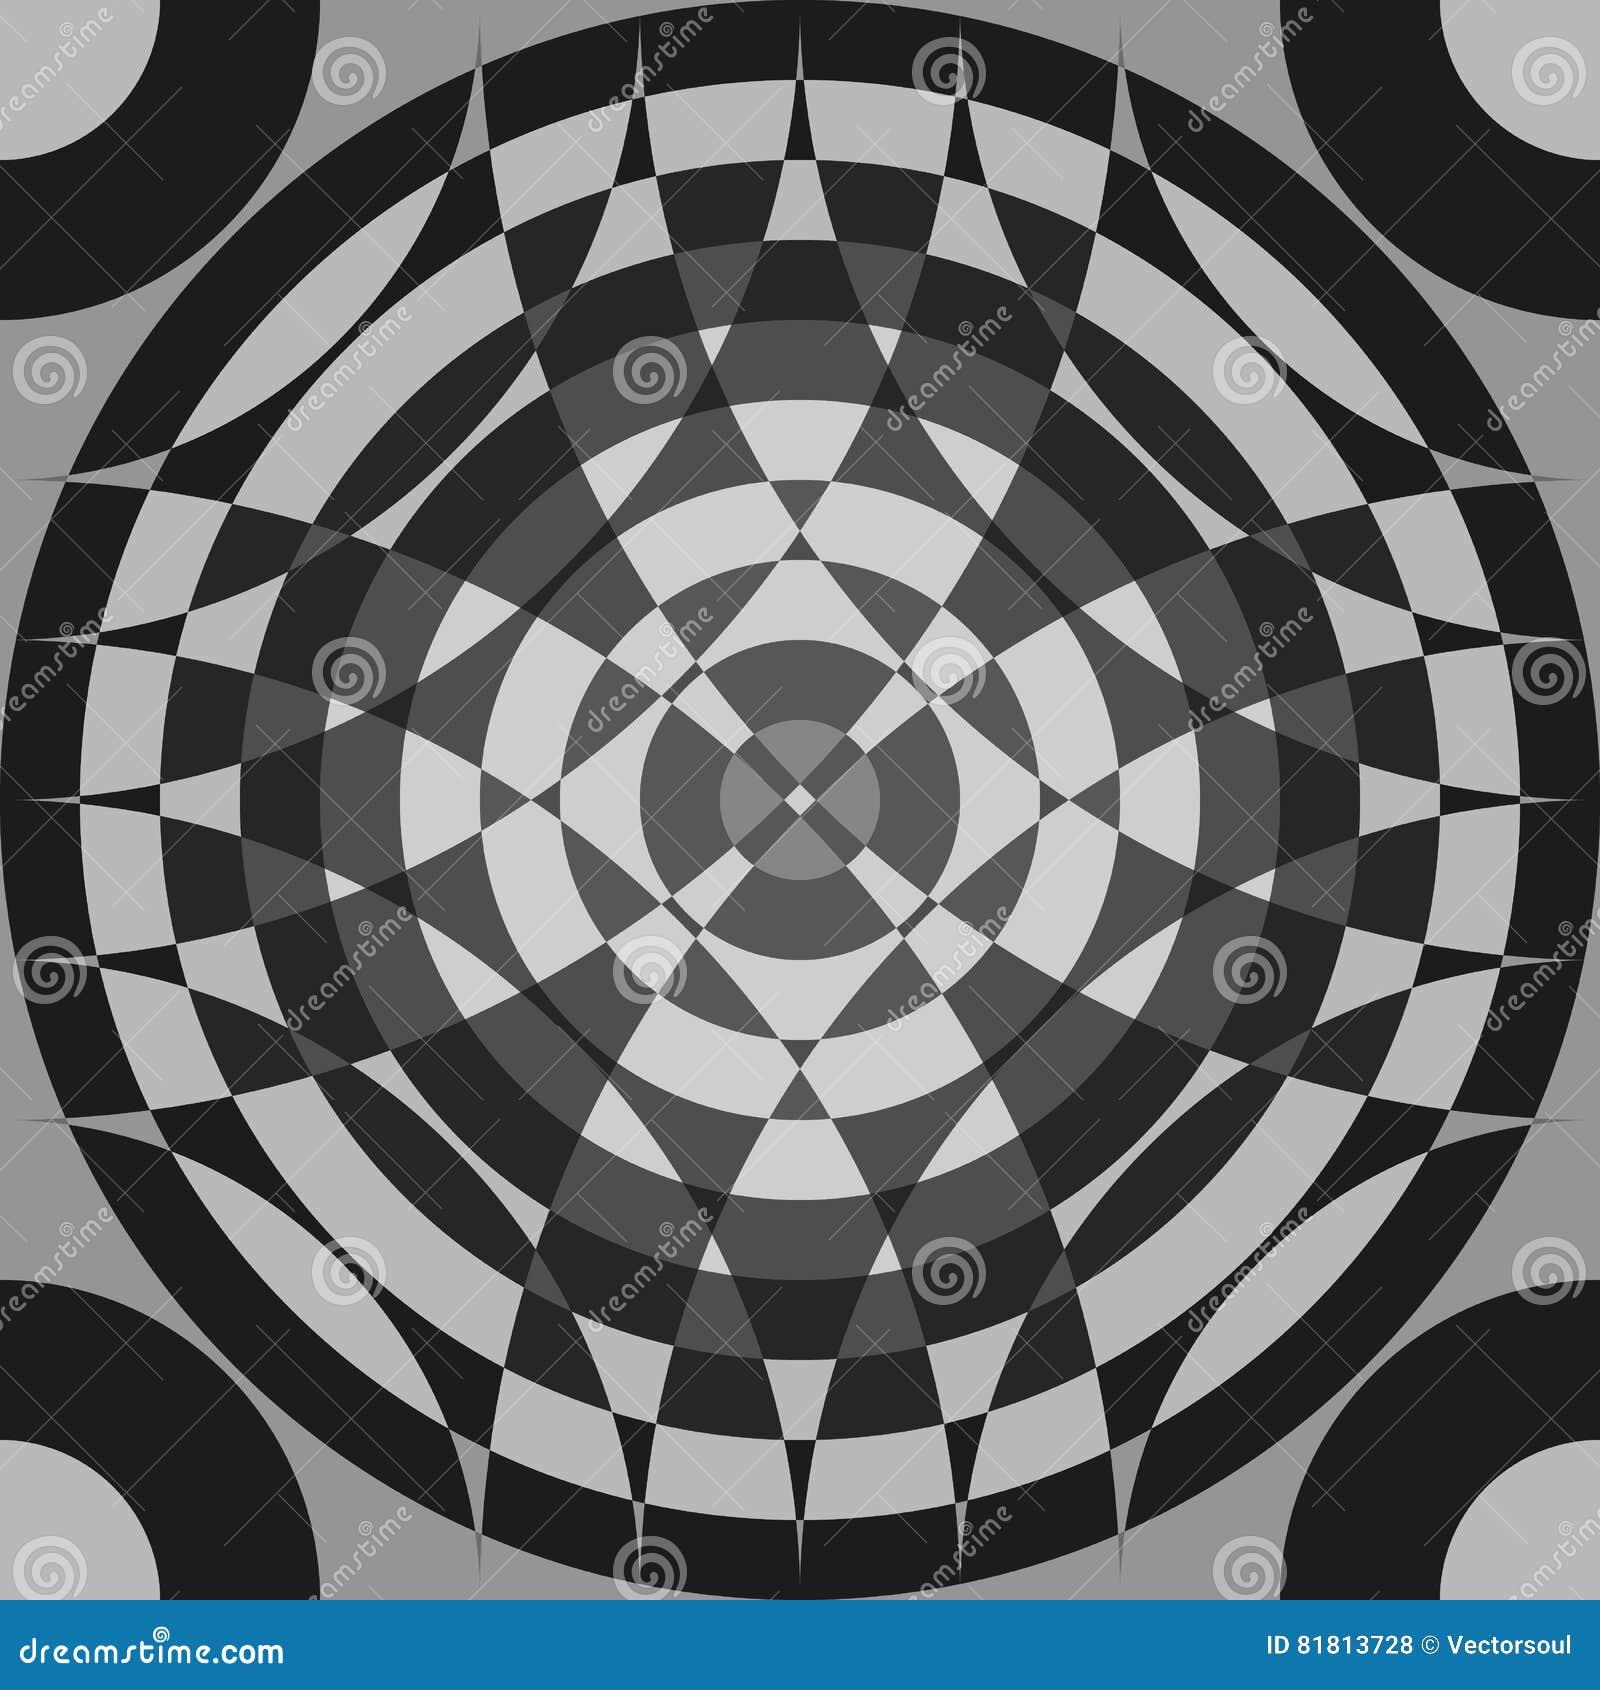 Repeatable поделенная на сегменты картина серой шкалы Monochrome абстрактный текст